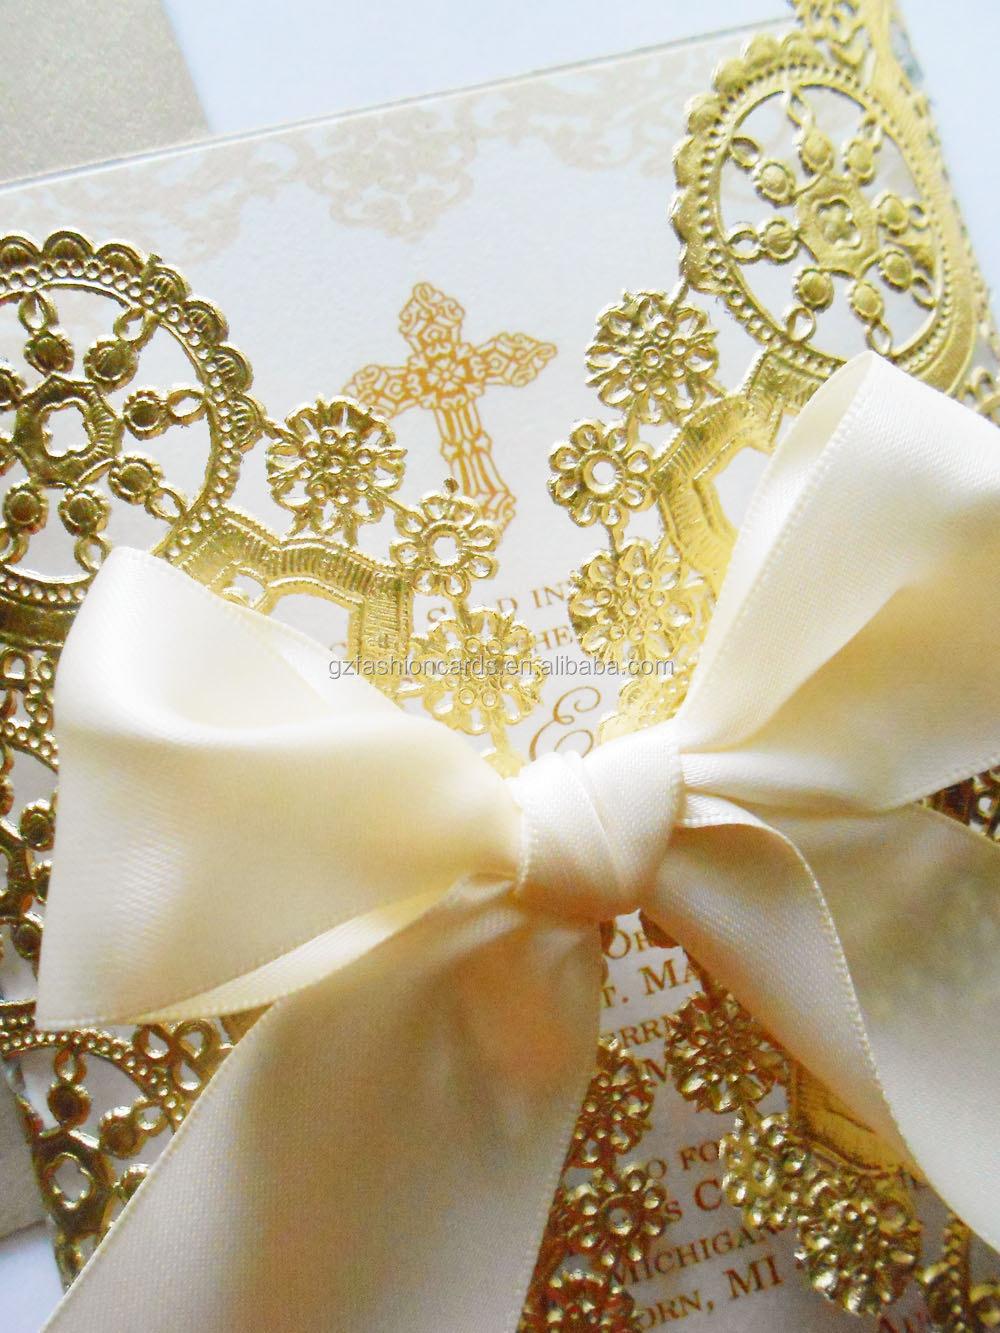 Doily Style Metallic Gold Invitation,Foil Paper Wedding Invitations ...